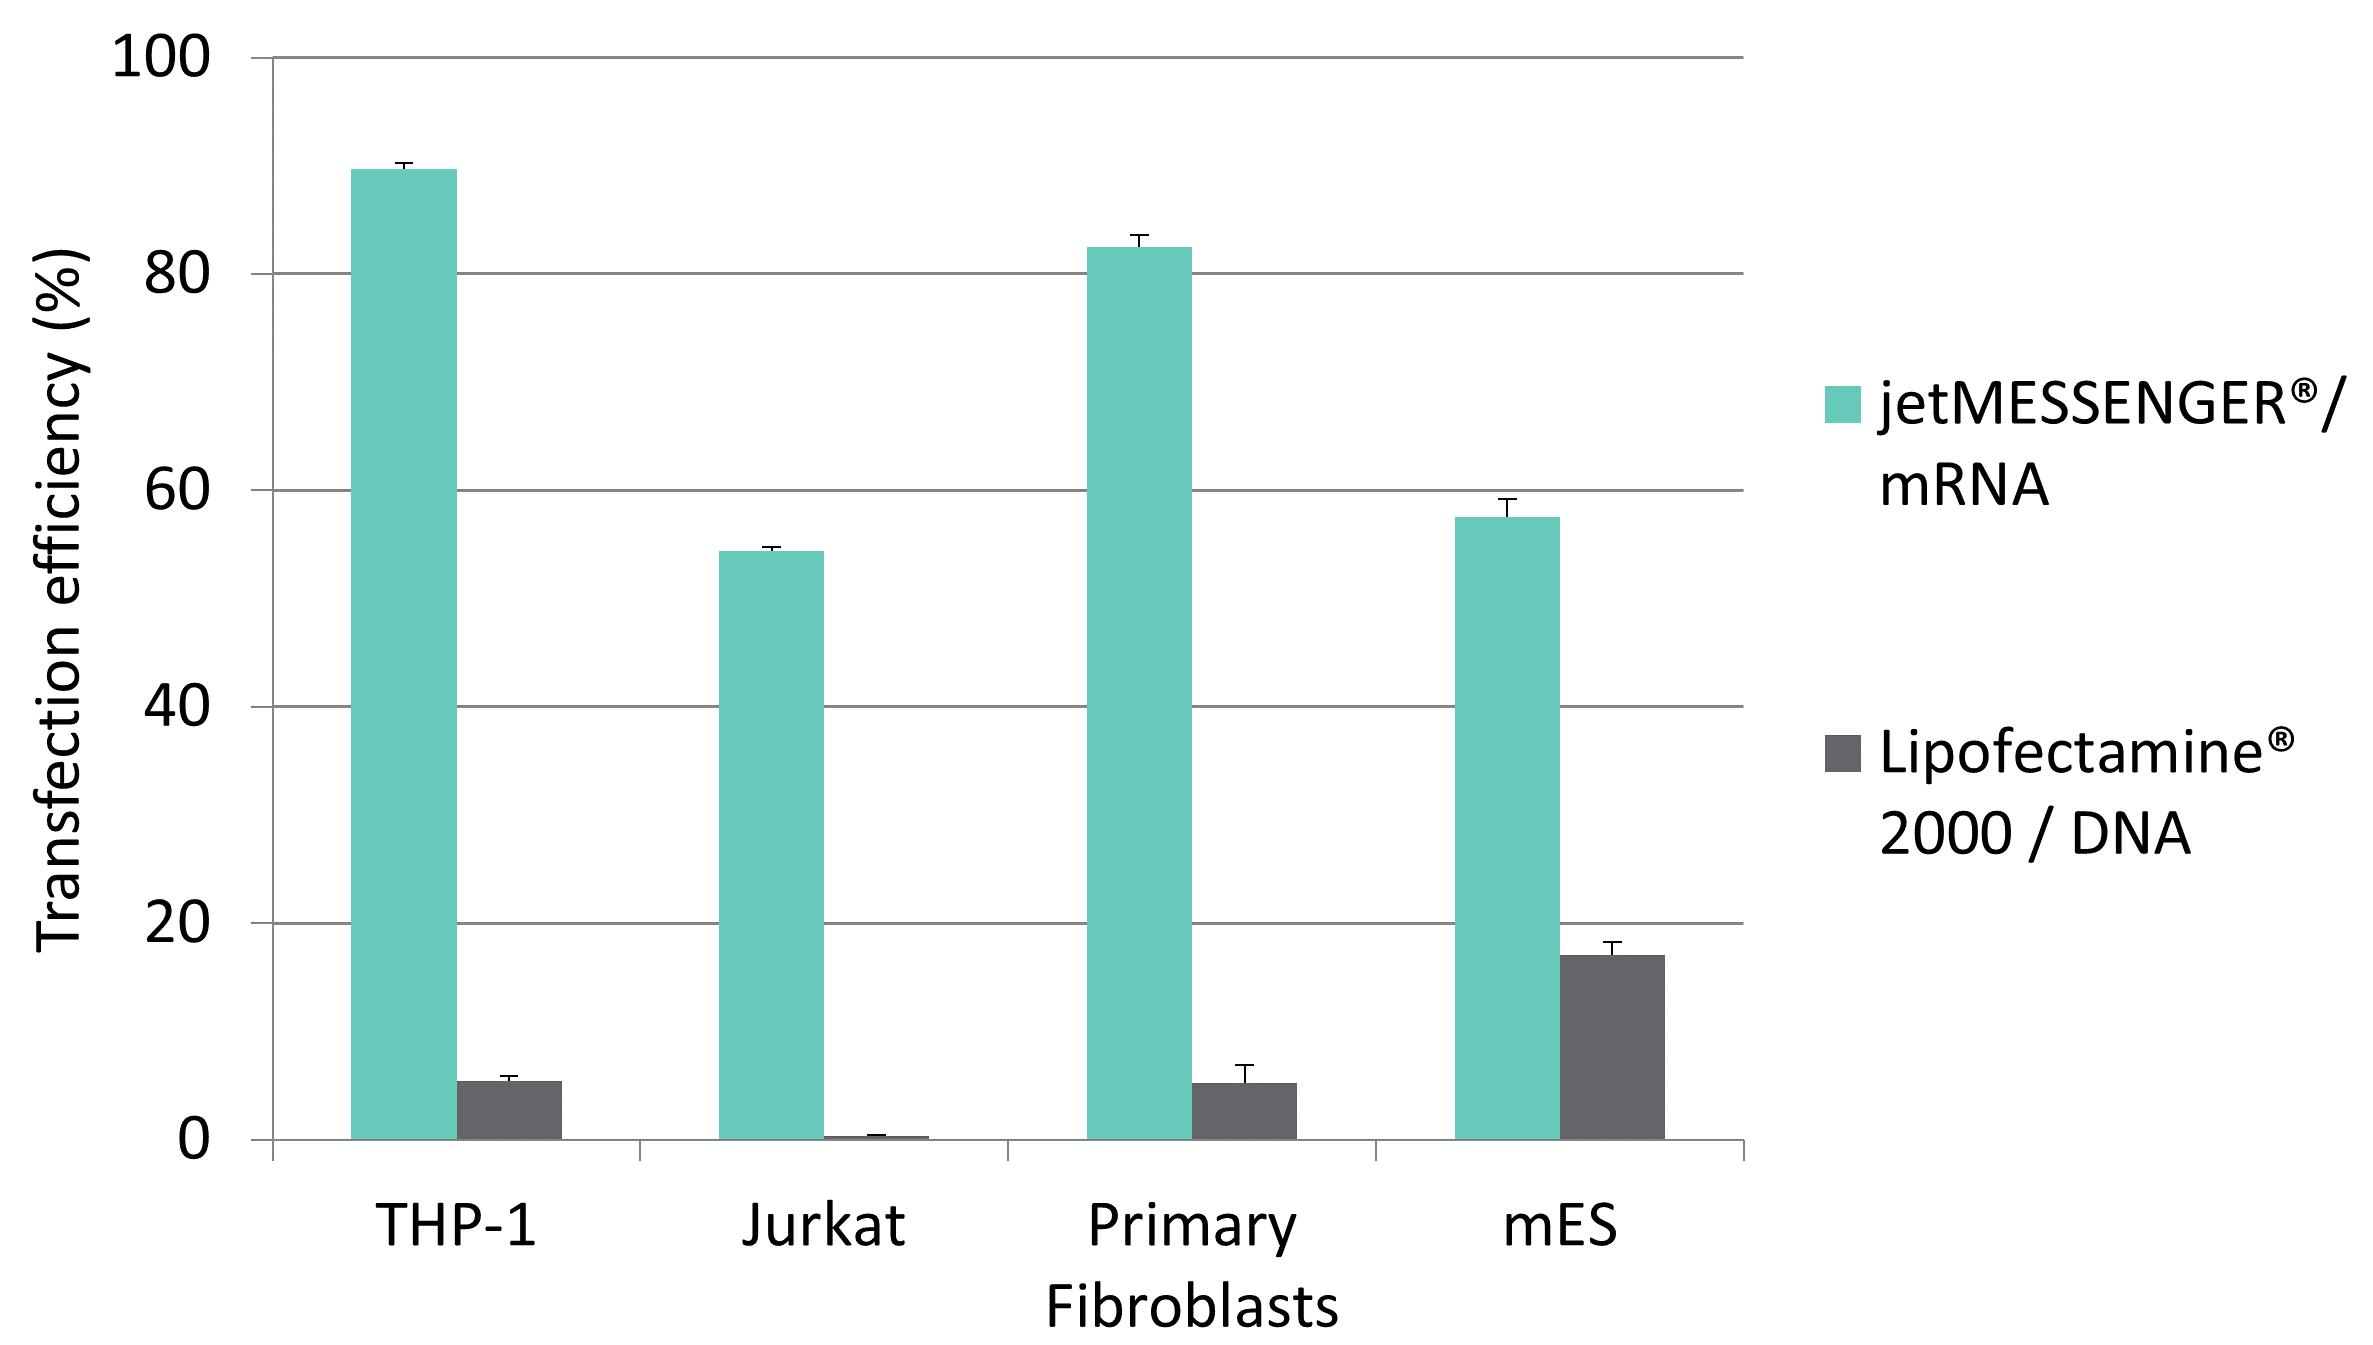 jetMESSENGER - mRNA - DNA comparison